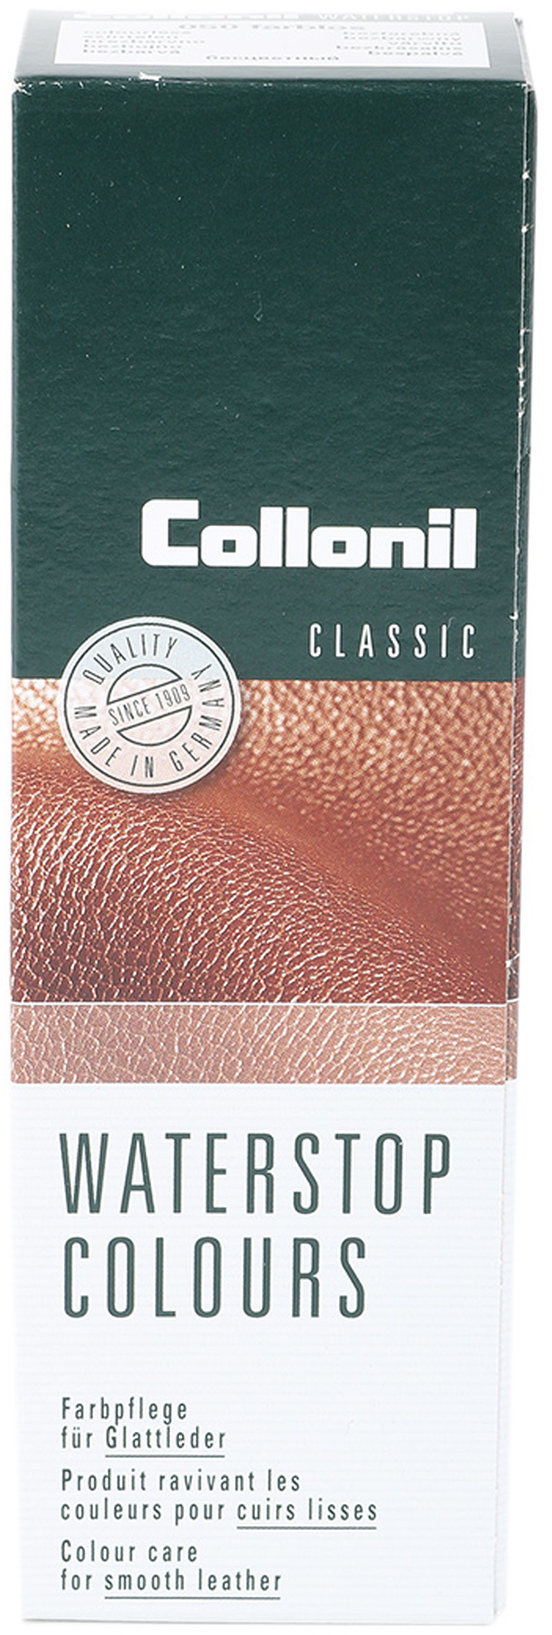 Collonil Waterstop Leather Cream Chestnut foto 0